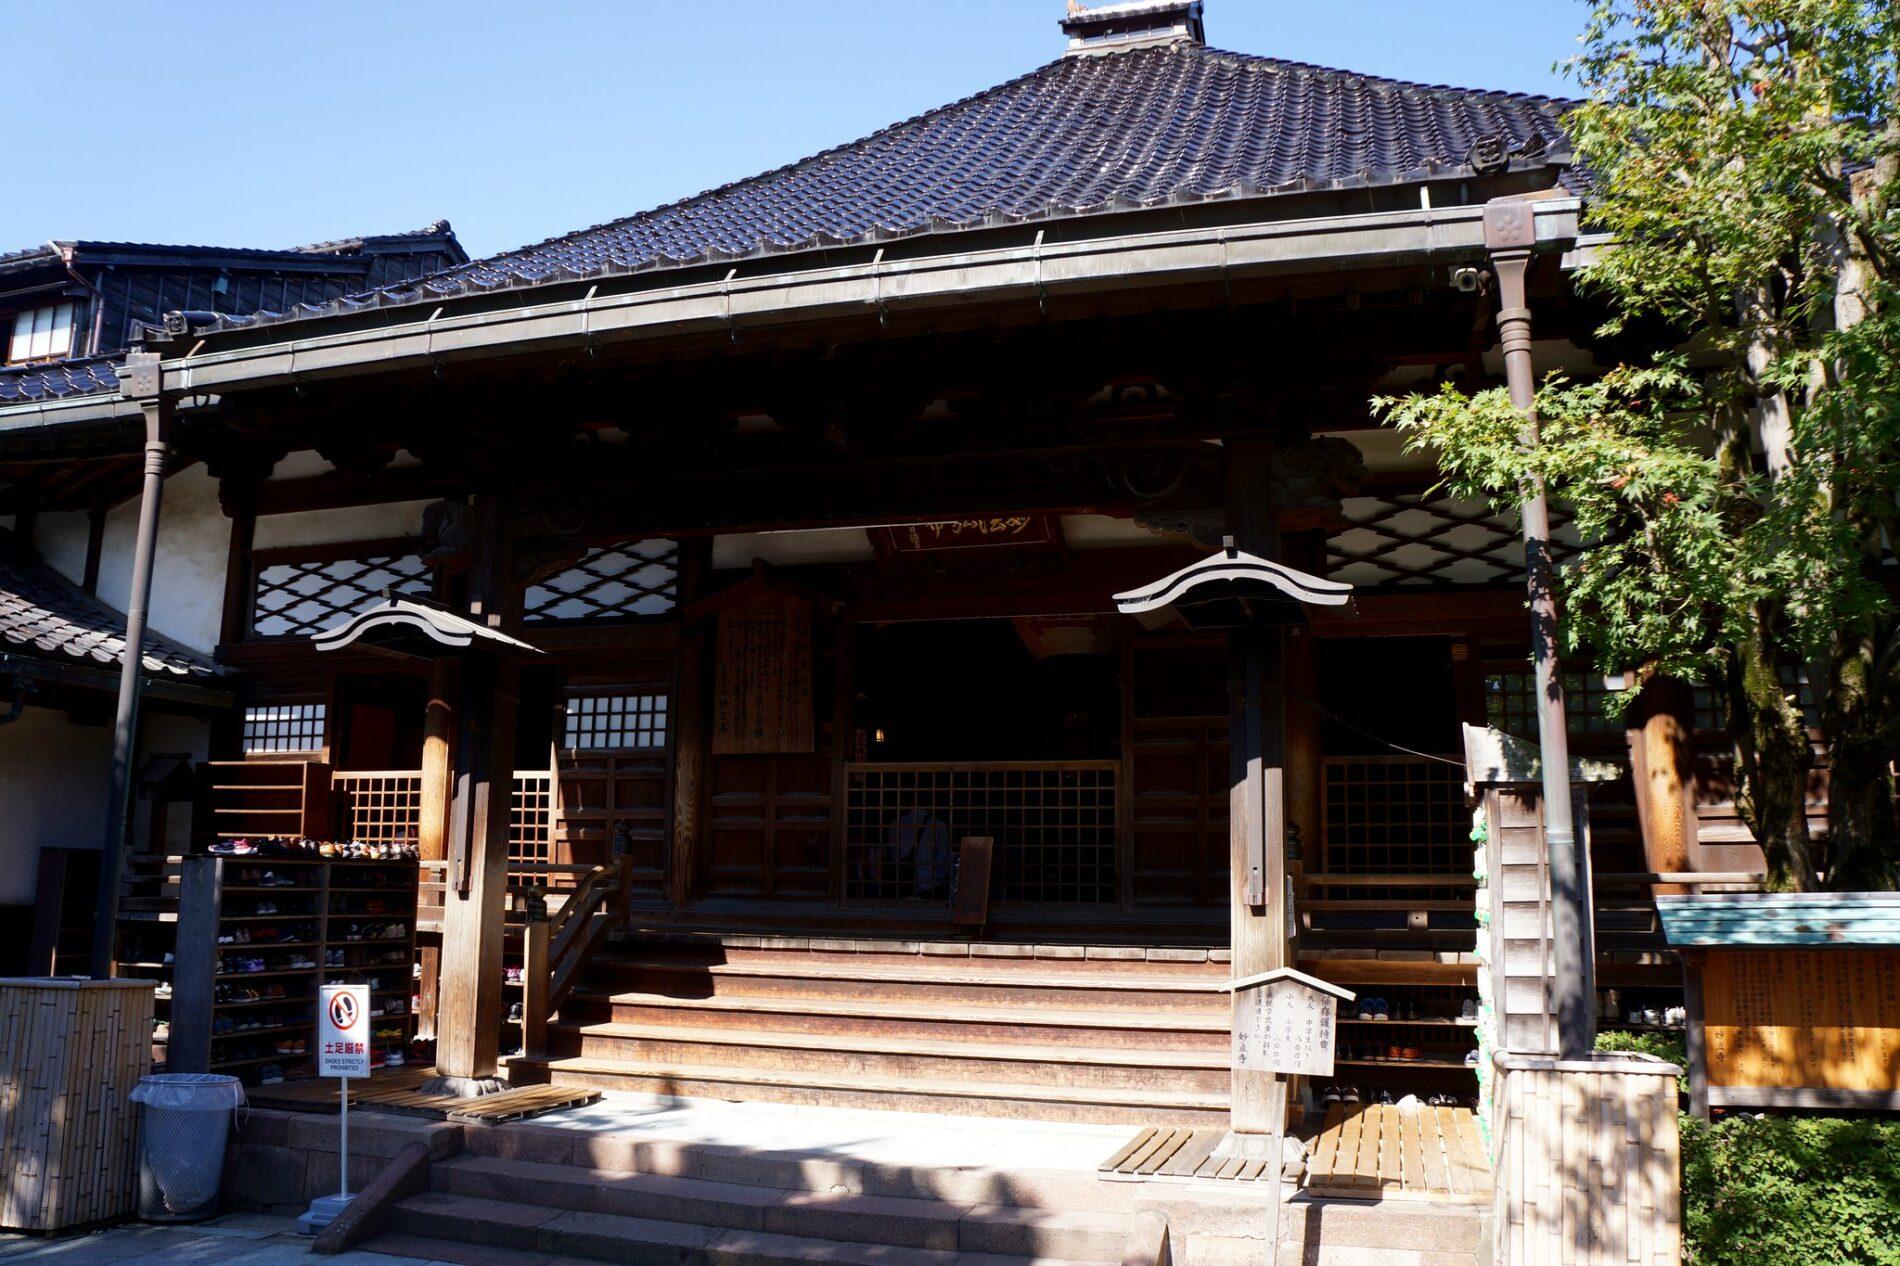 Der Myoryu-ji Tempel in kanazawa ist weitläufig unter dem Namen Ninja-Tempel bekannt. (Foto: Kentaro Ohno auf Flickr https://flic.kr/p/yn8GBj CC0 1.0 https://creativecommons.org/publicdomain/zero/1.0/)